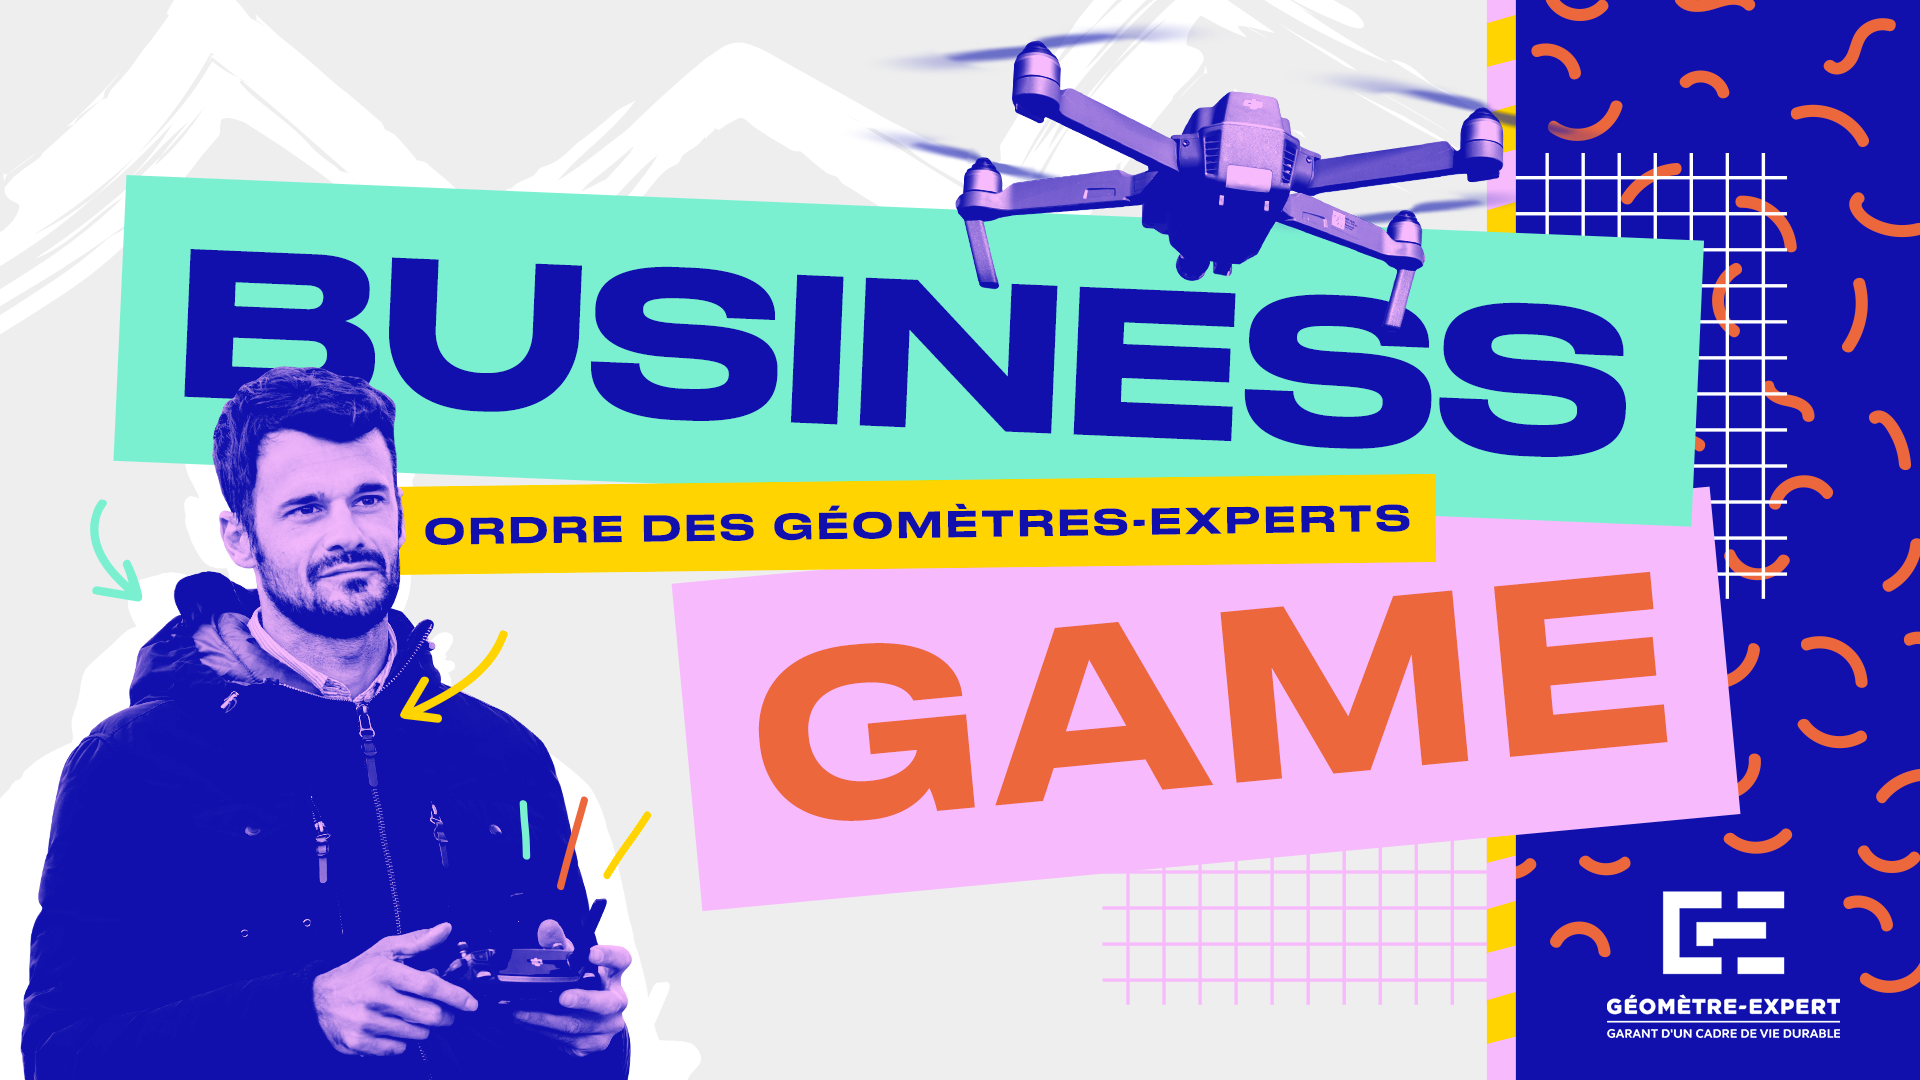 GEOMETRE_EXPERT_BUSINESSGAME_KV_3